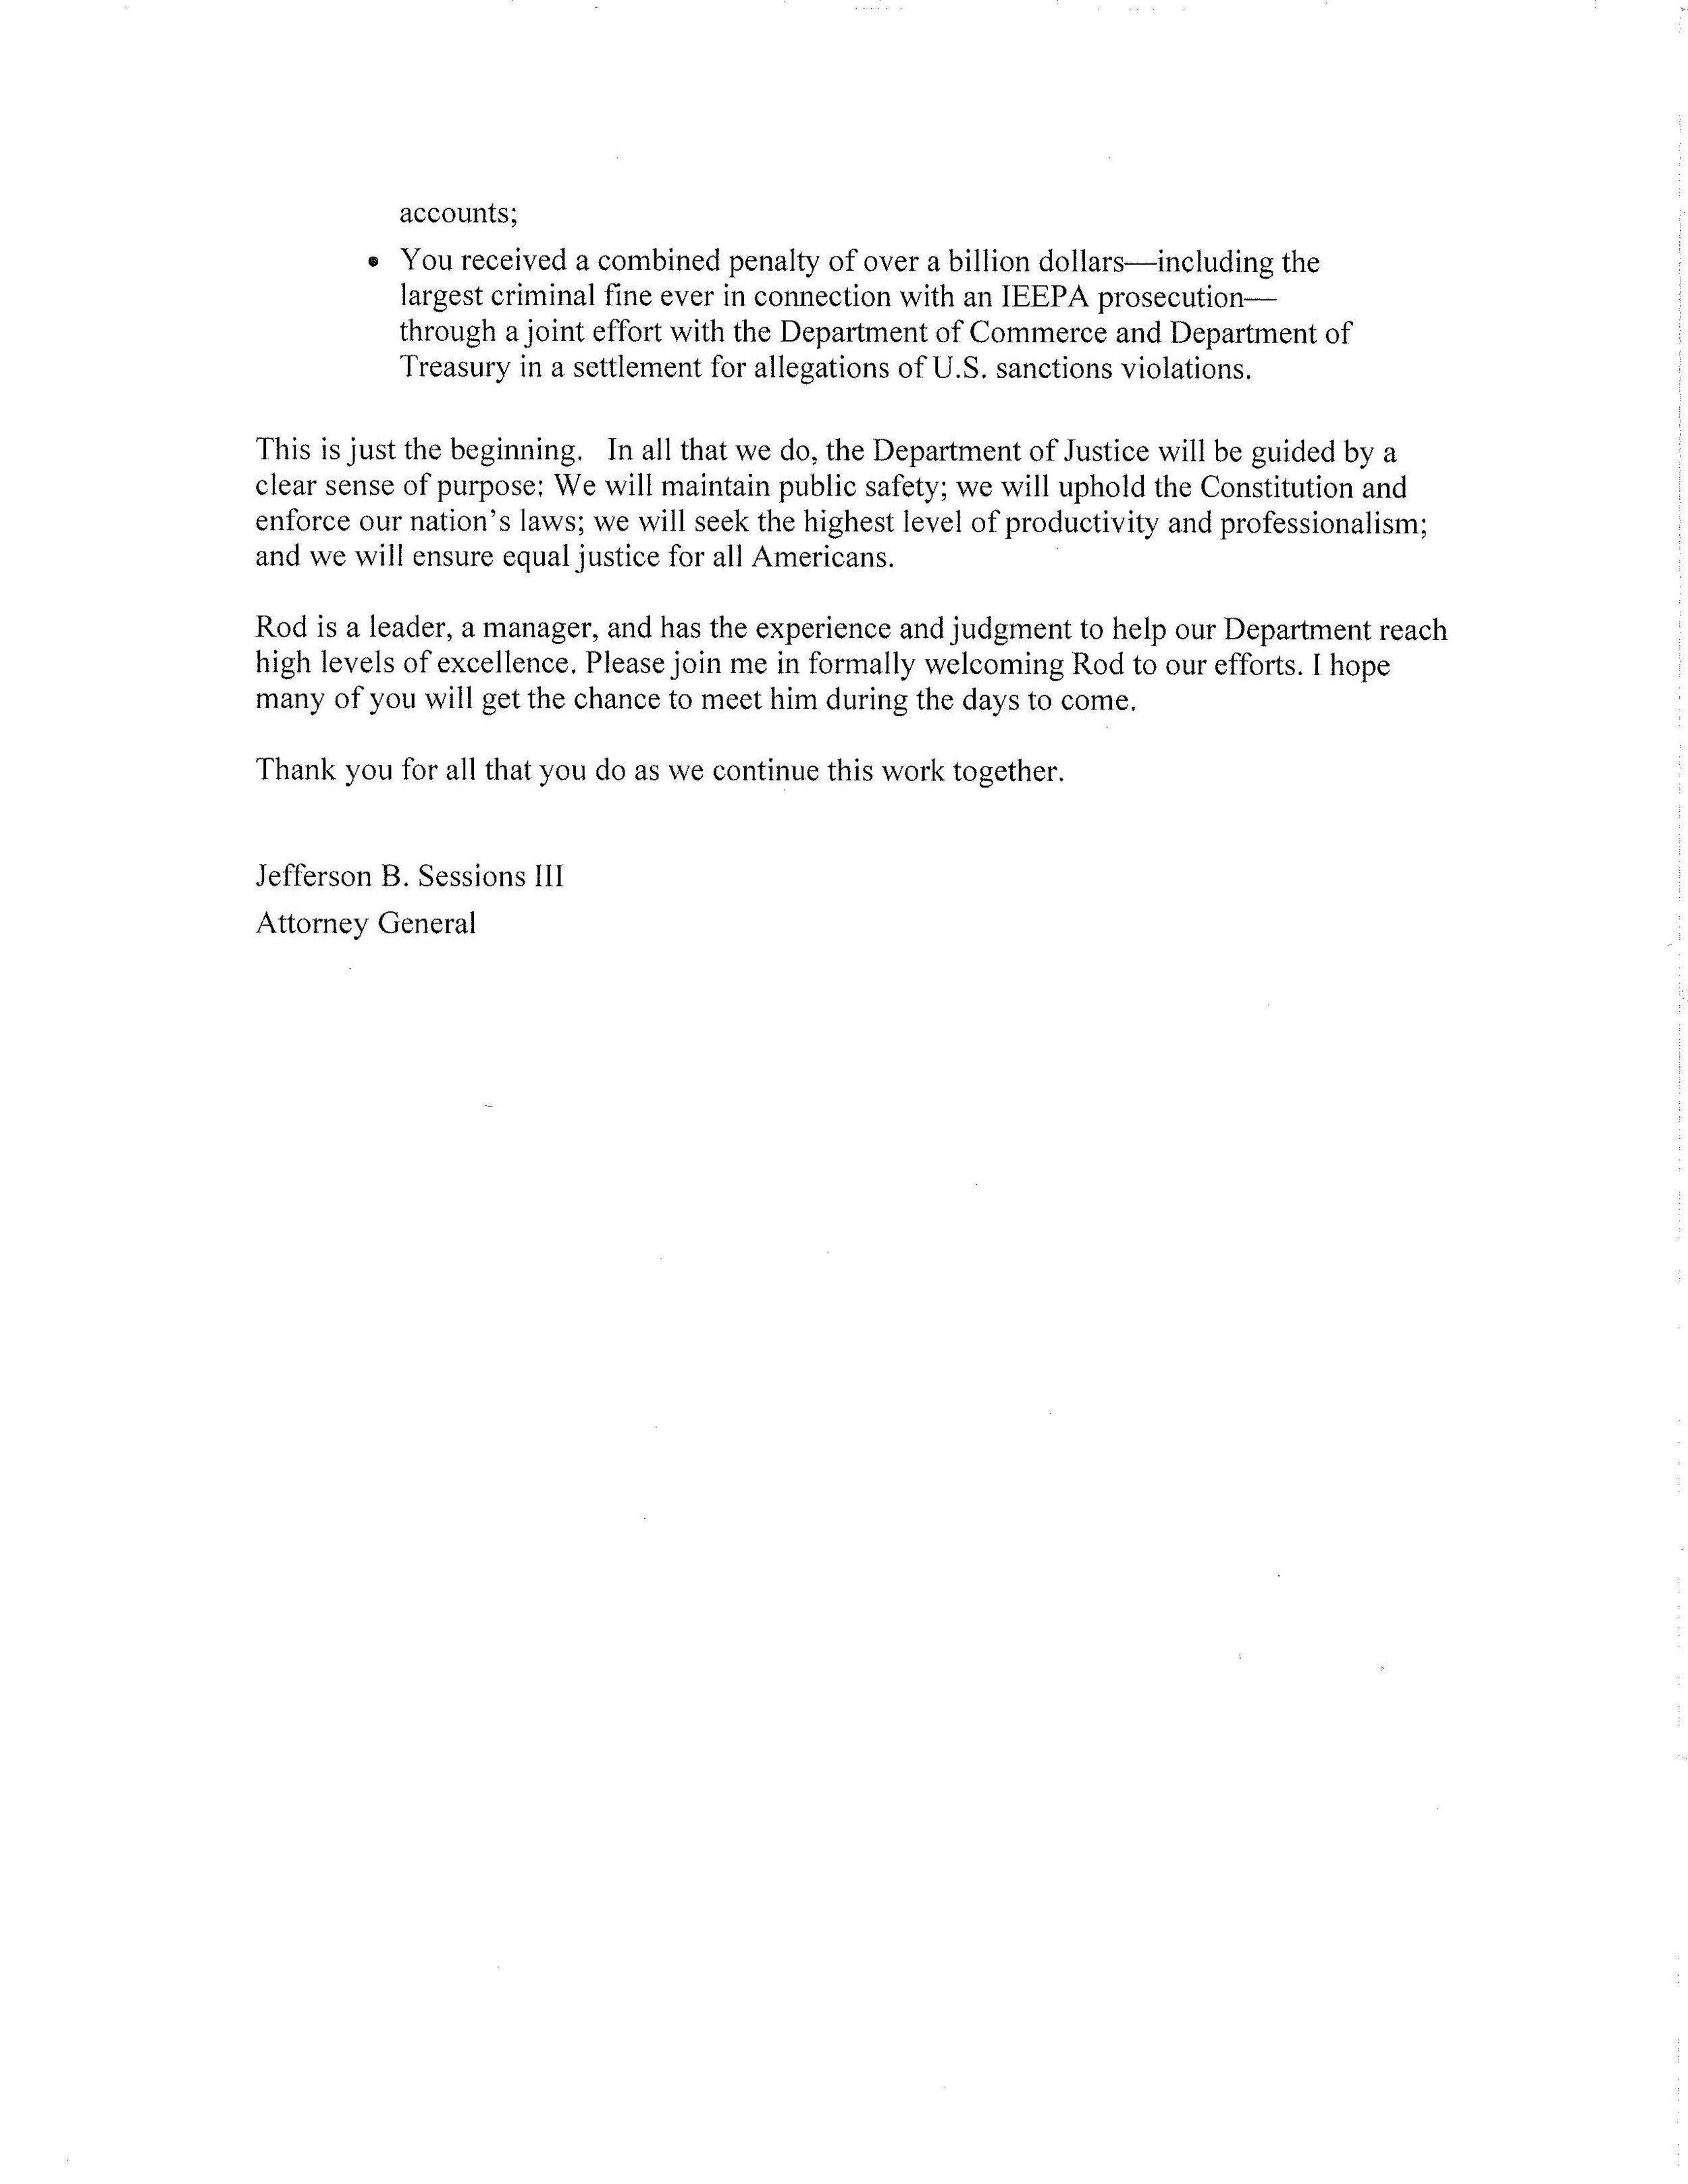 DOJ_Sessions-Rosenstein-welcome_Page_2.jpg